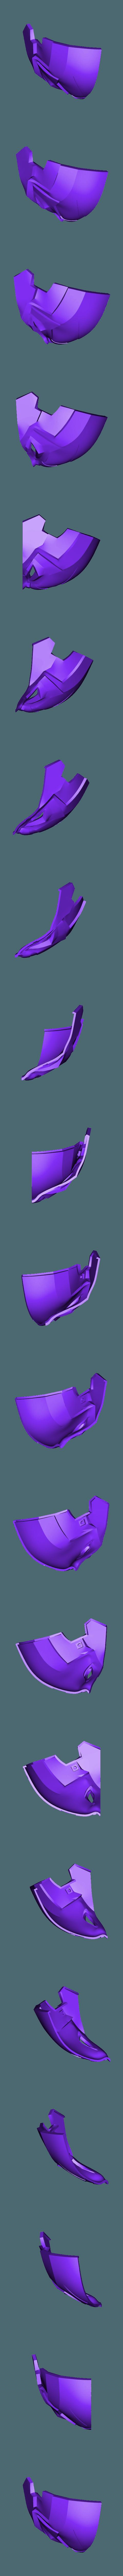 Red X Part 1.stl Download STL file Deathstroke Injustice Helmet • 3D printable model, VillainousPropShop